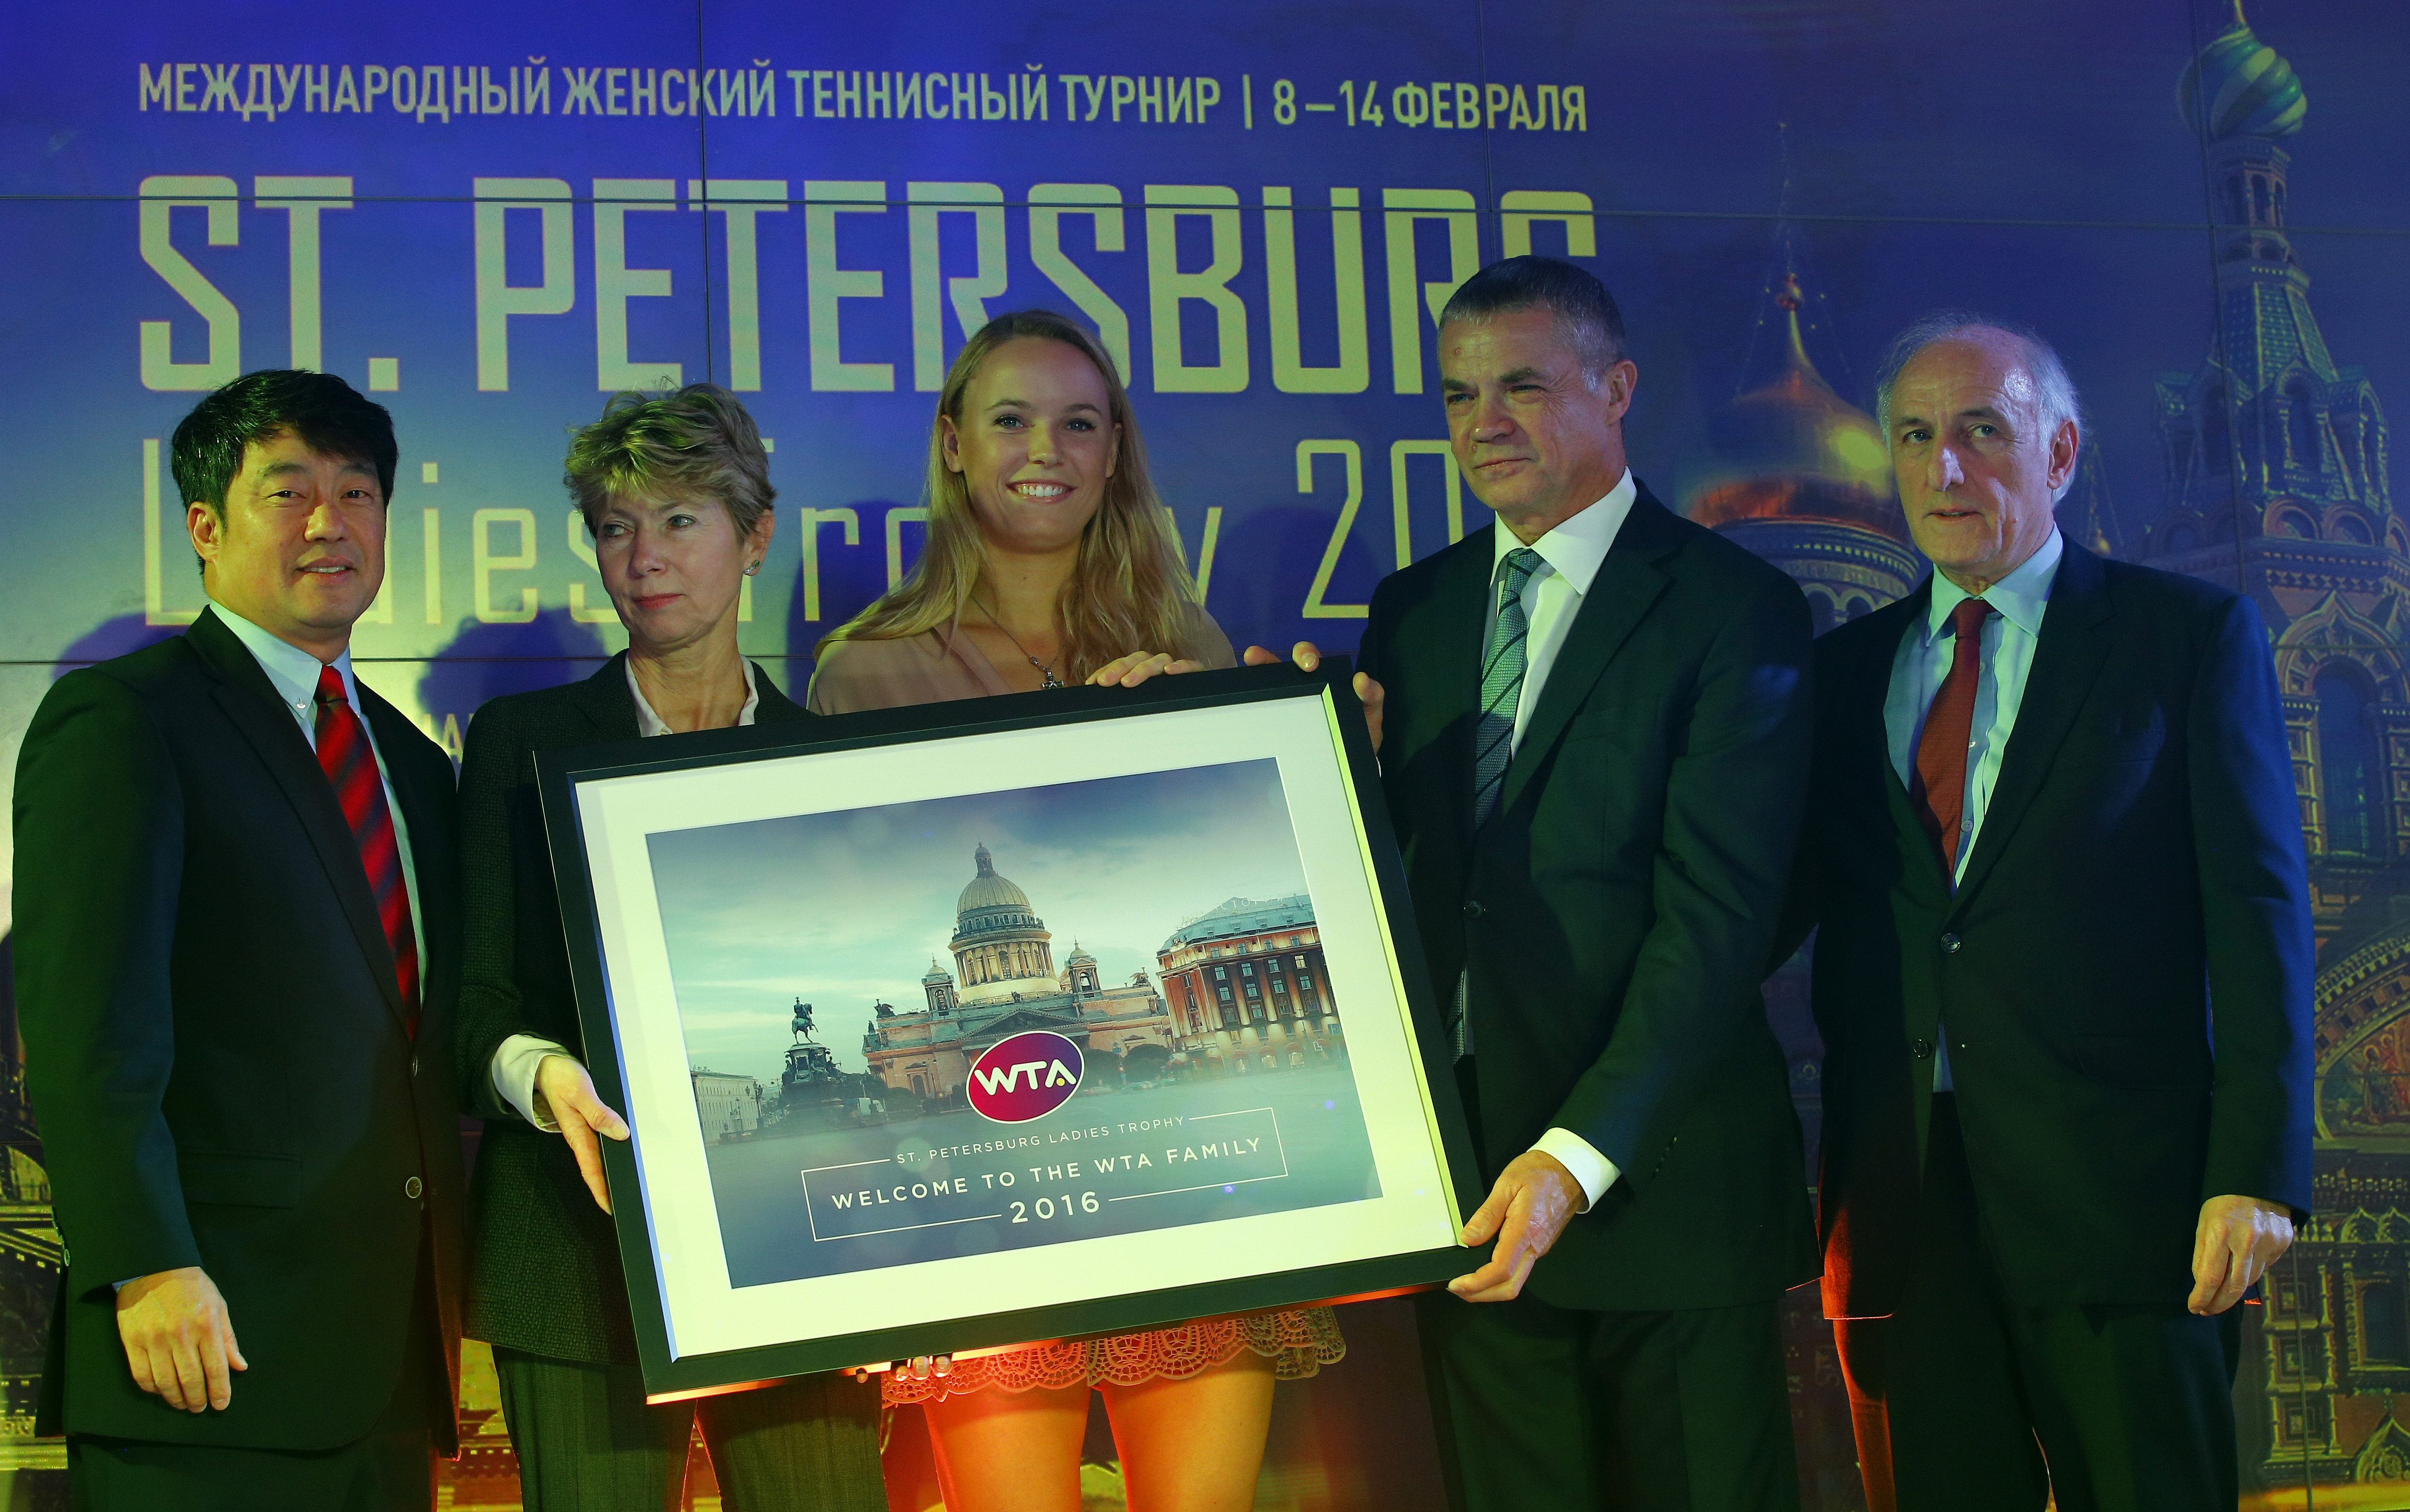 Наталия Камельзон, Каролин Возняцки, Александр Медведев